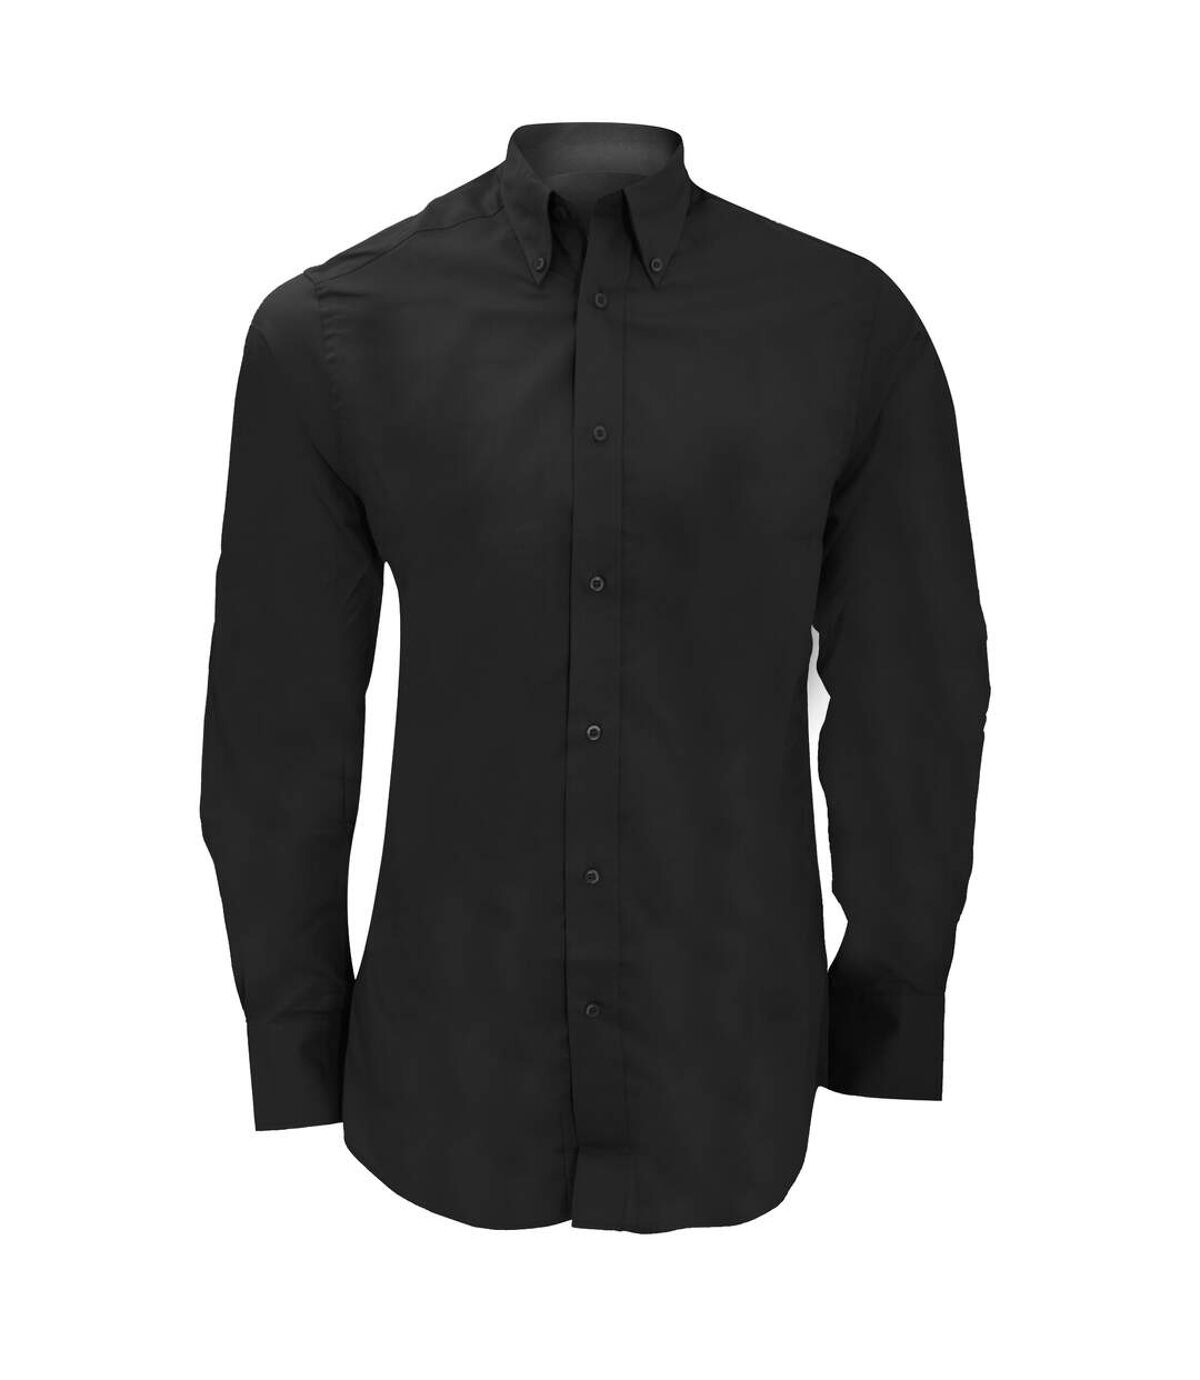 Kustom Kit Mens City Long Sleeve Business Shirt (Black) - UTBC1449